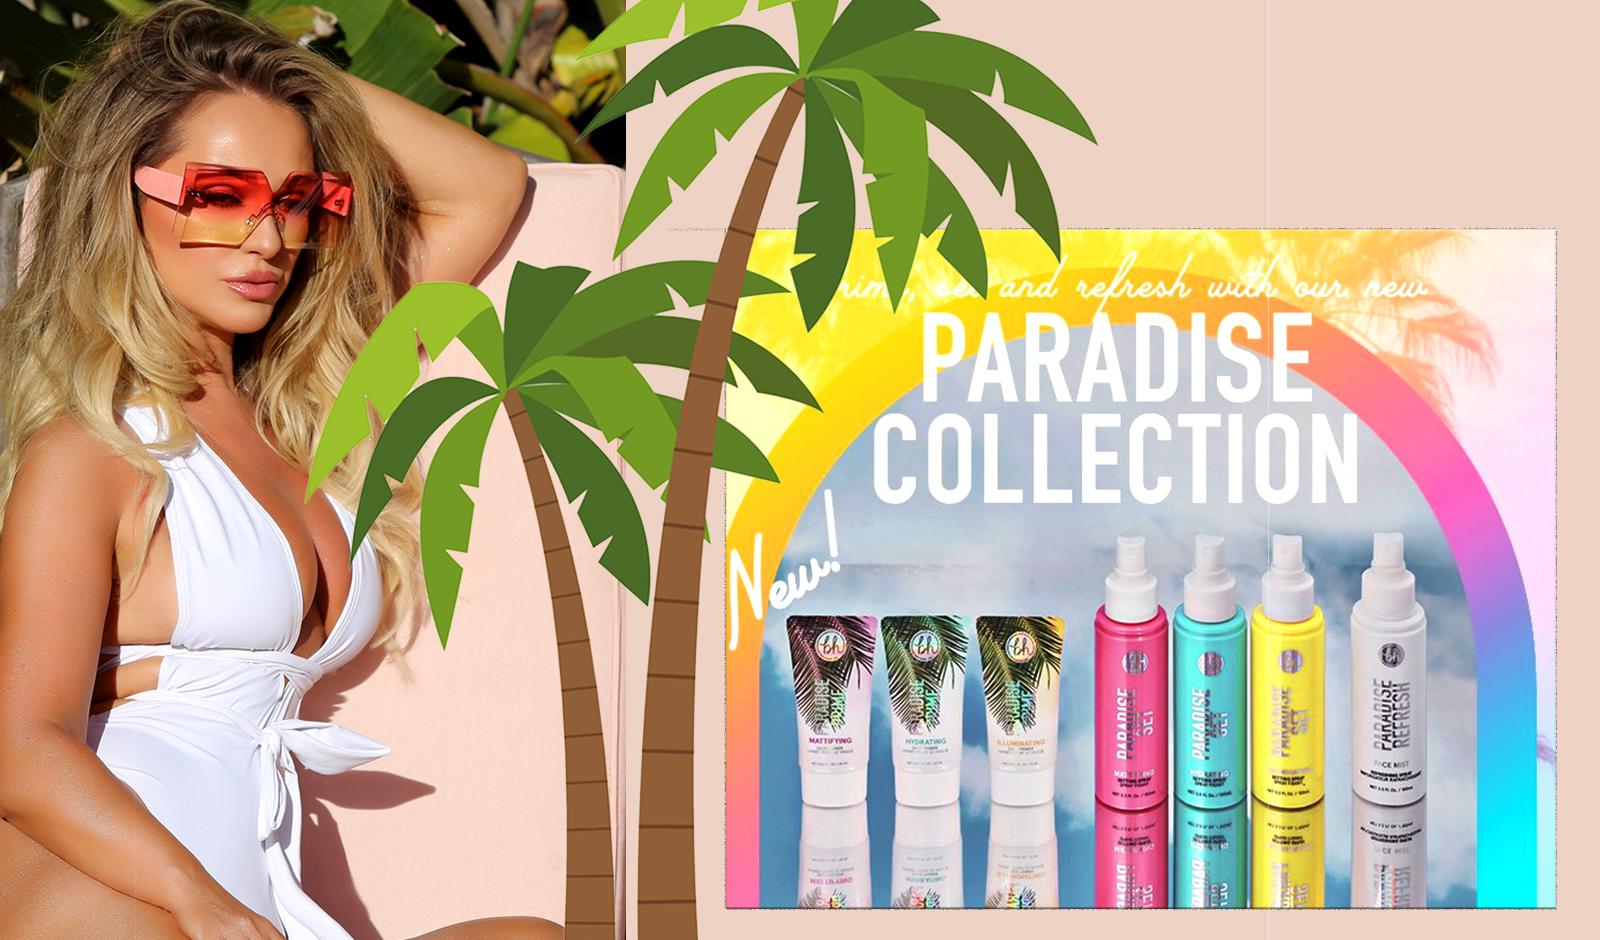 bh-cosmetics-paradise-collection-katarina-van-derham